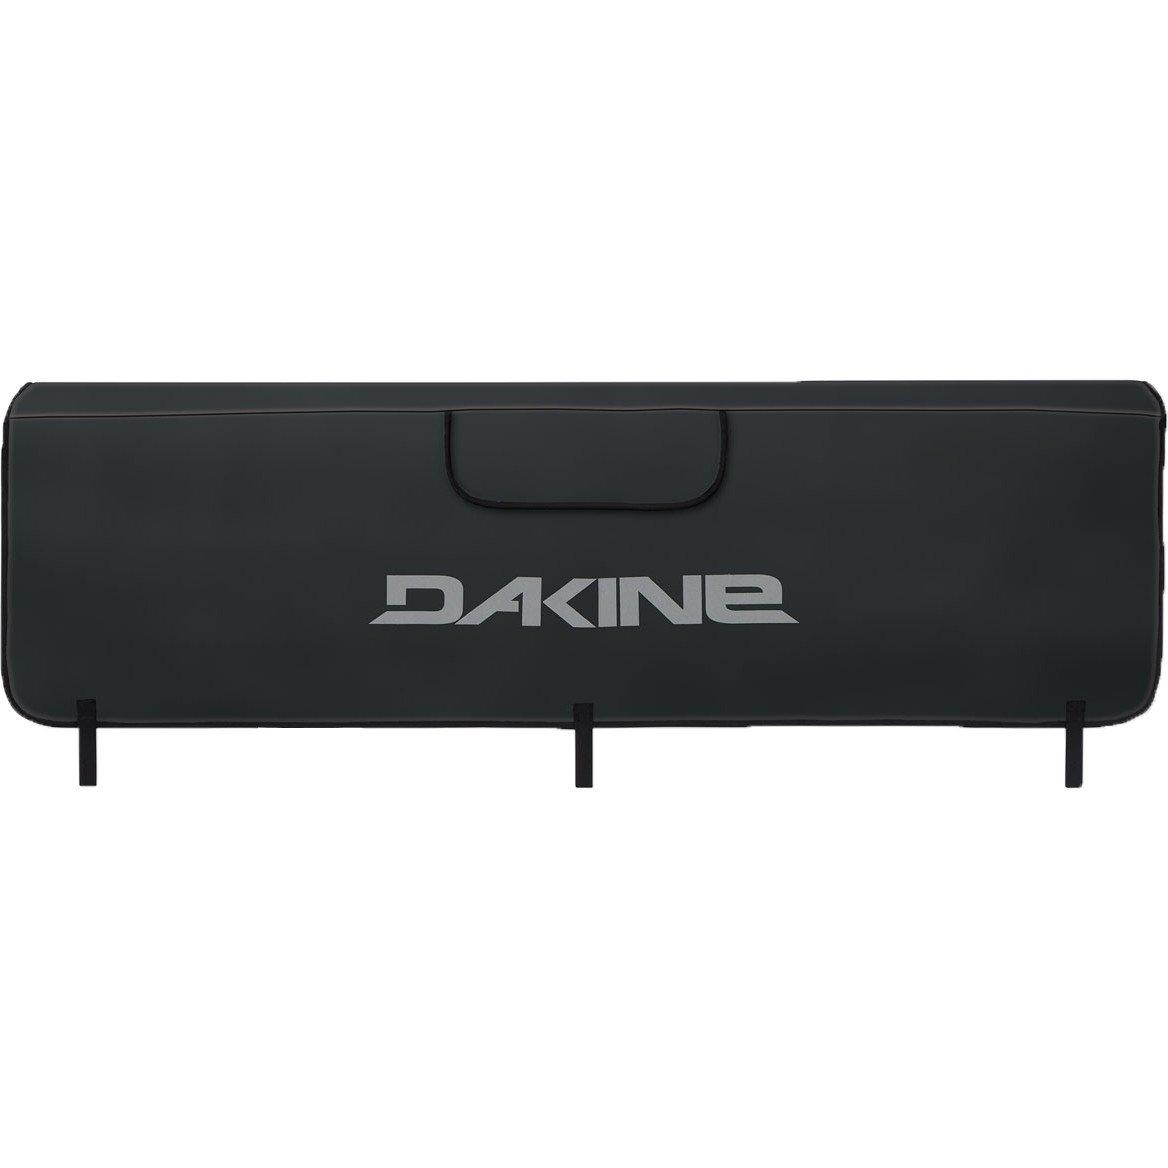 Dakine DLX Pickup Tailgate Pad Bike Rack, Black, Small